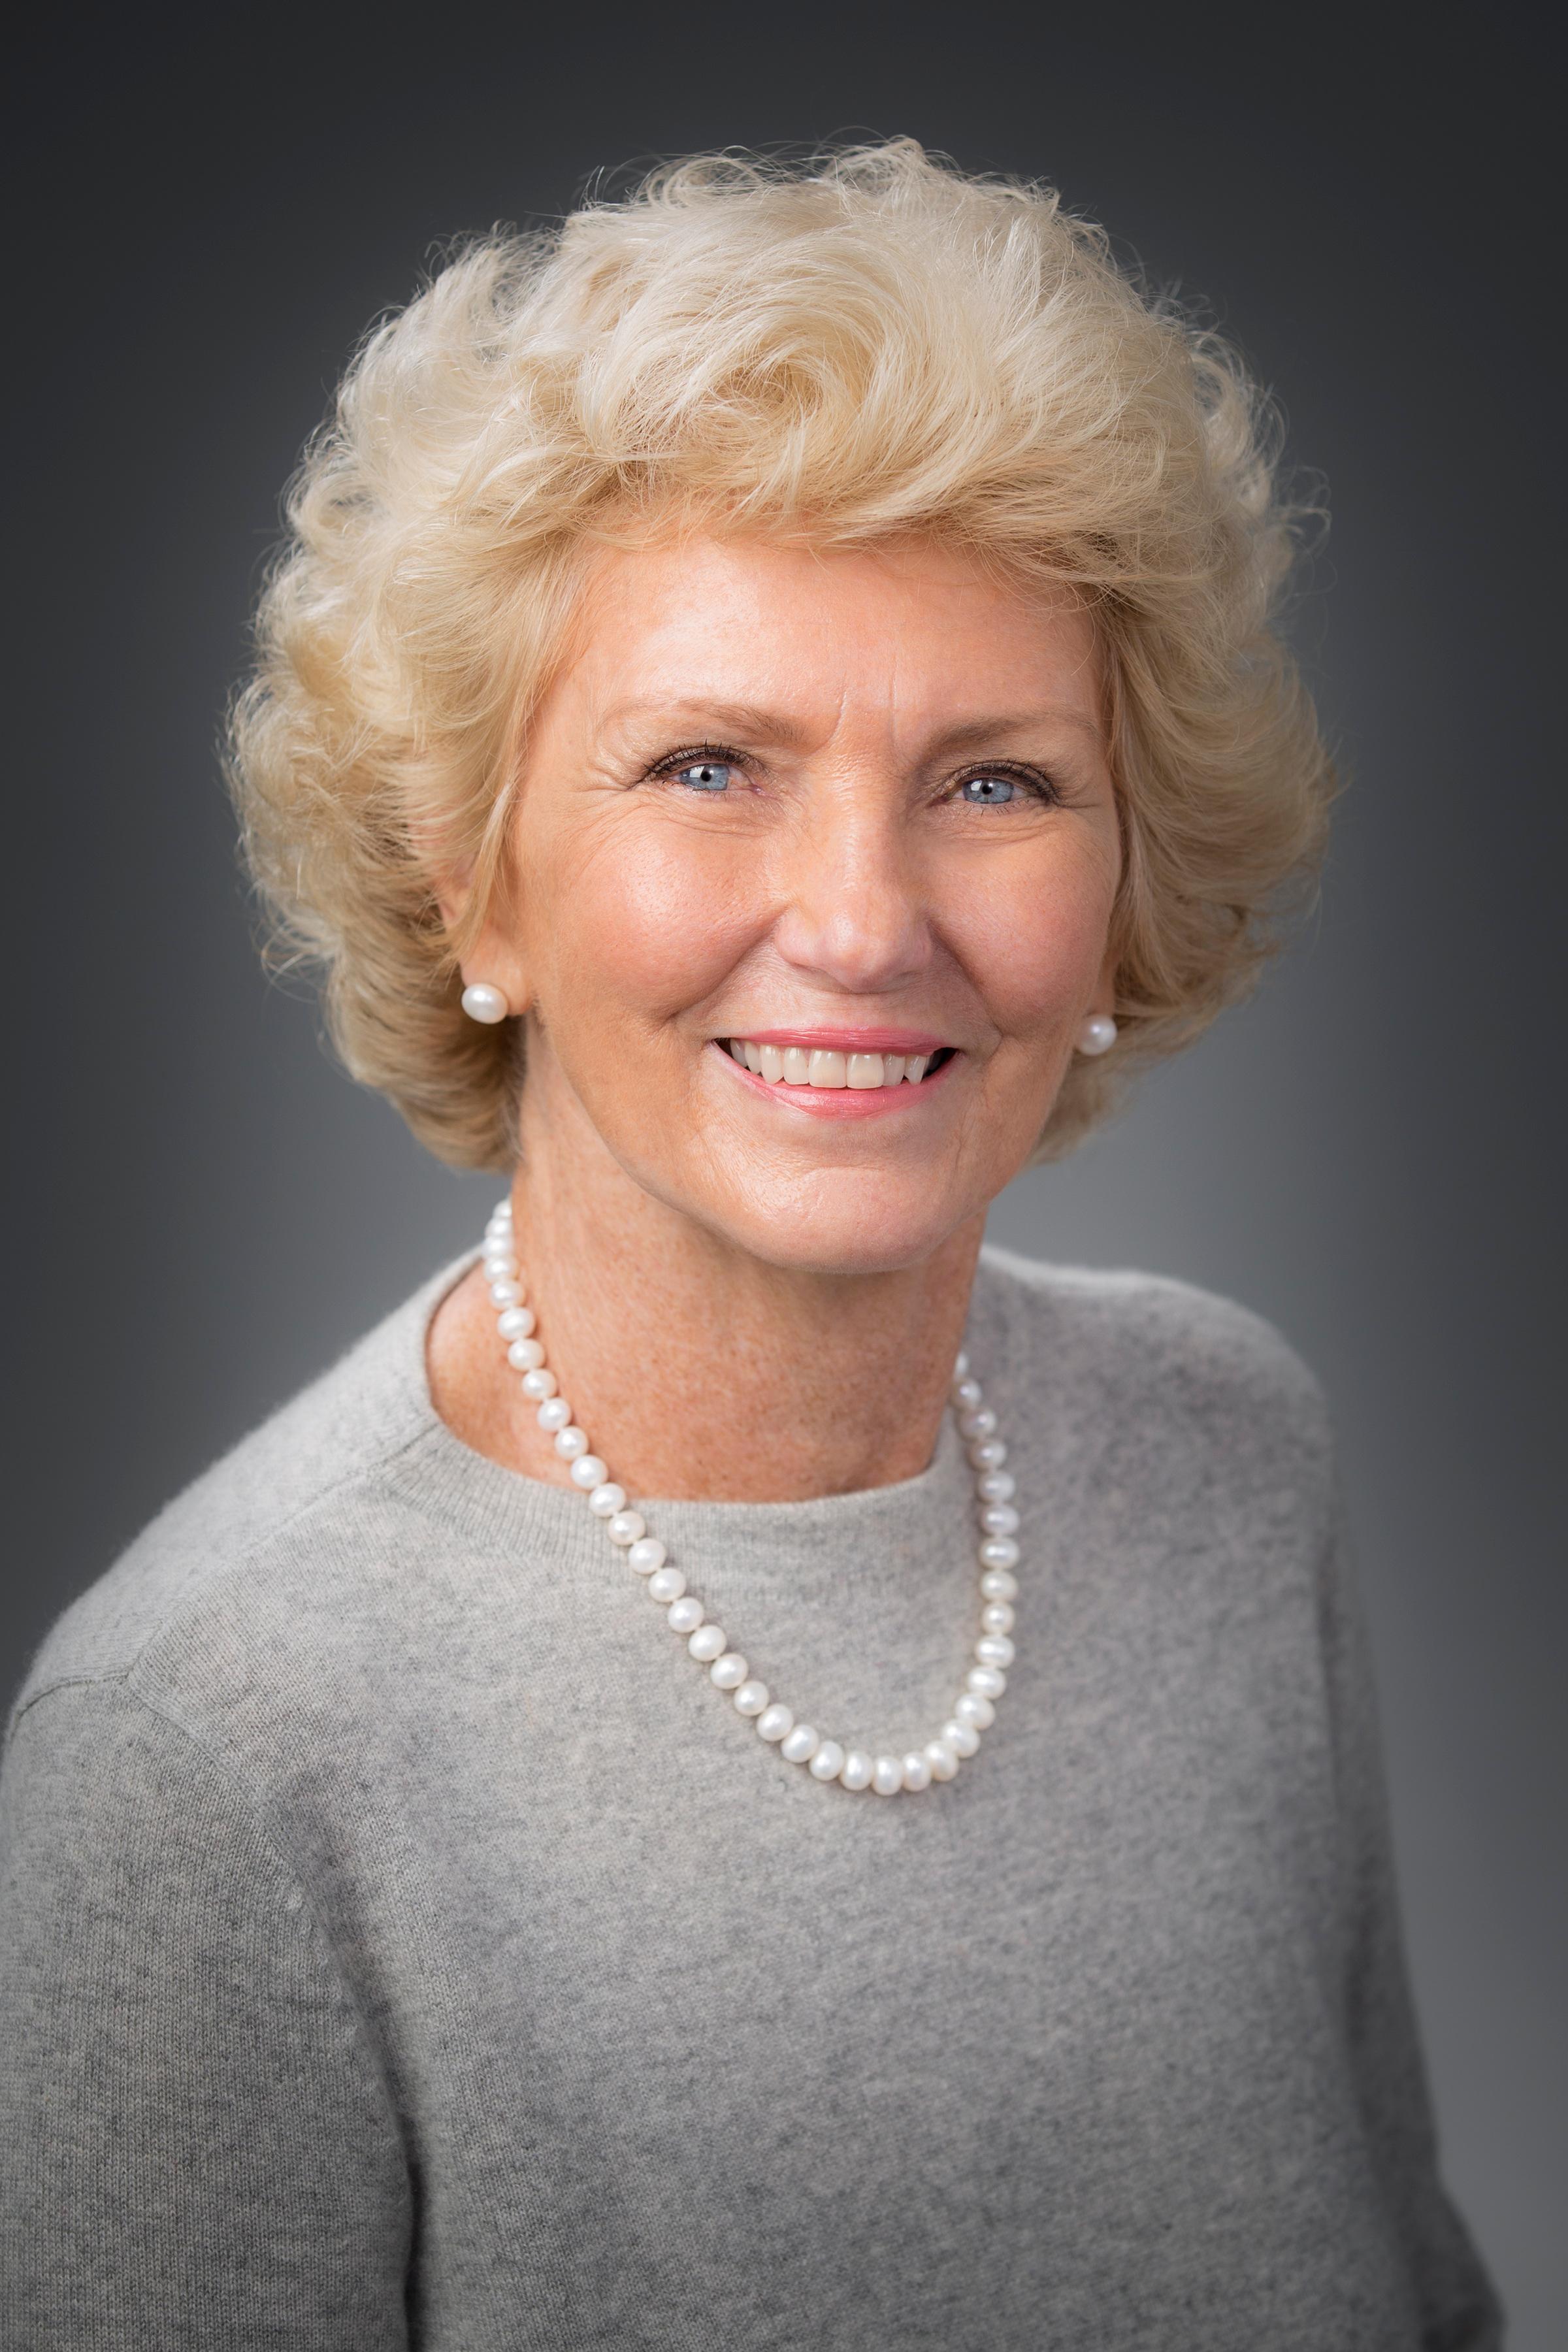 Cheryl Ryland, President & CEO